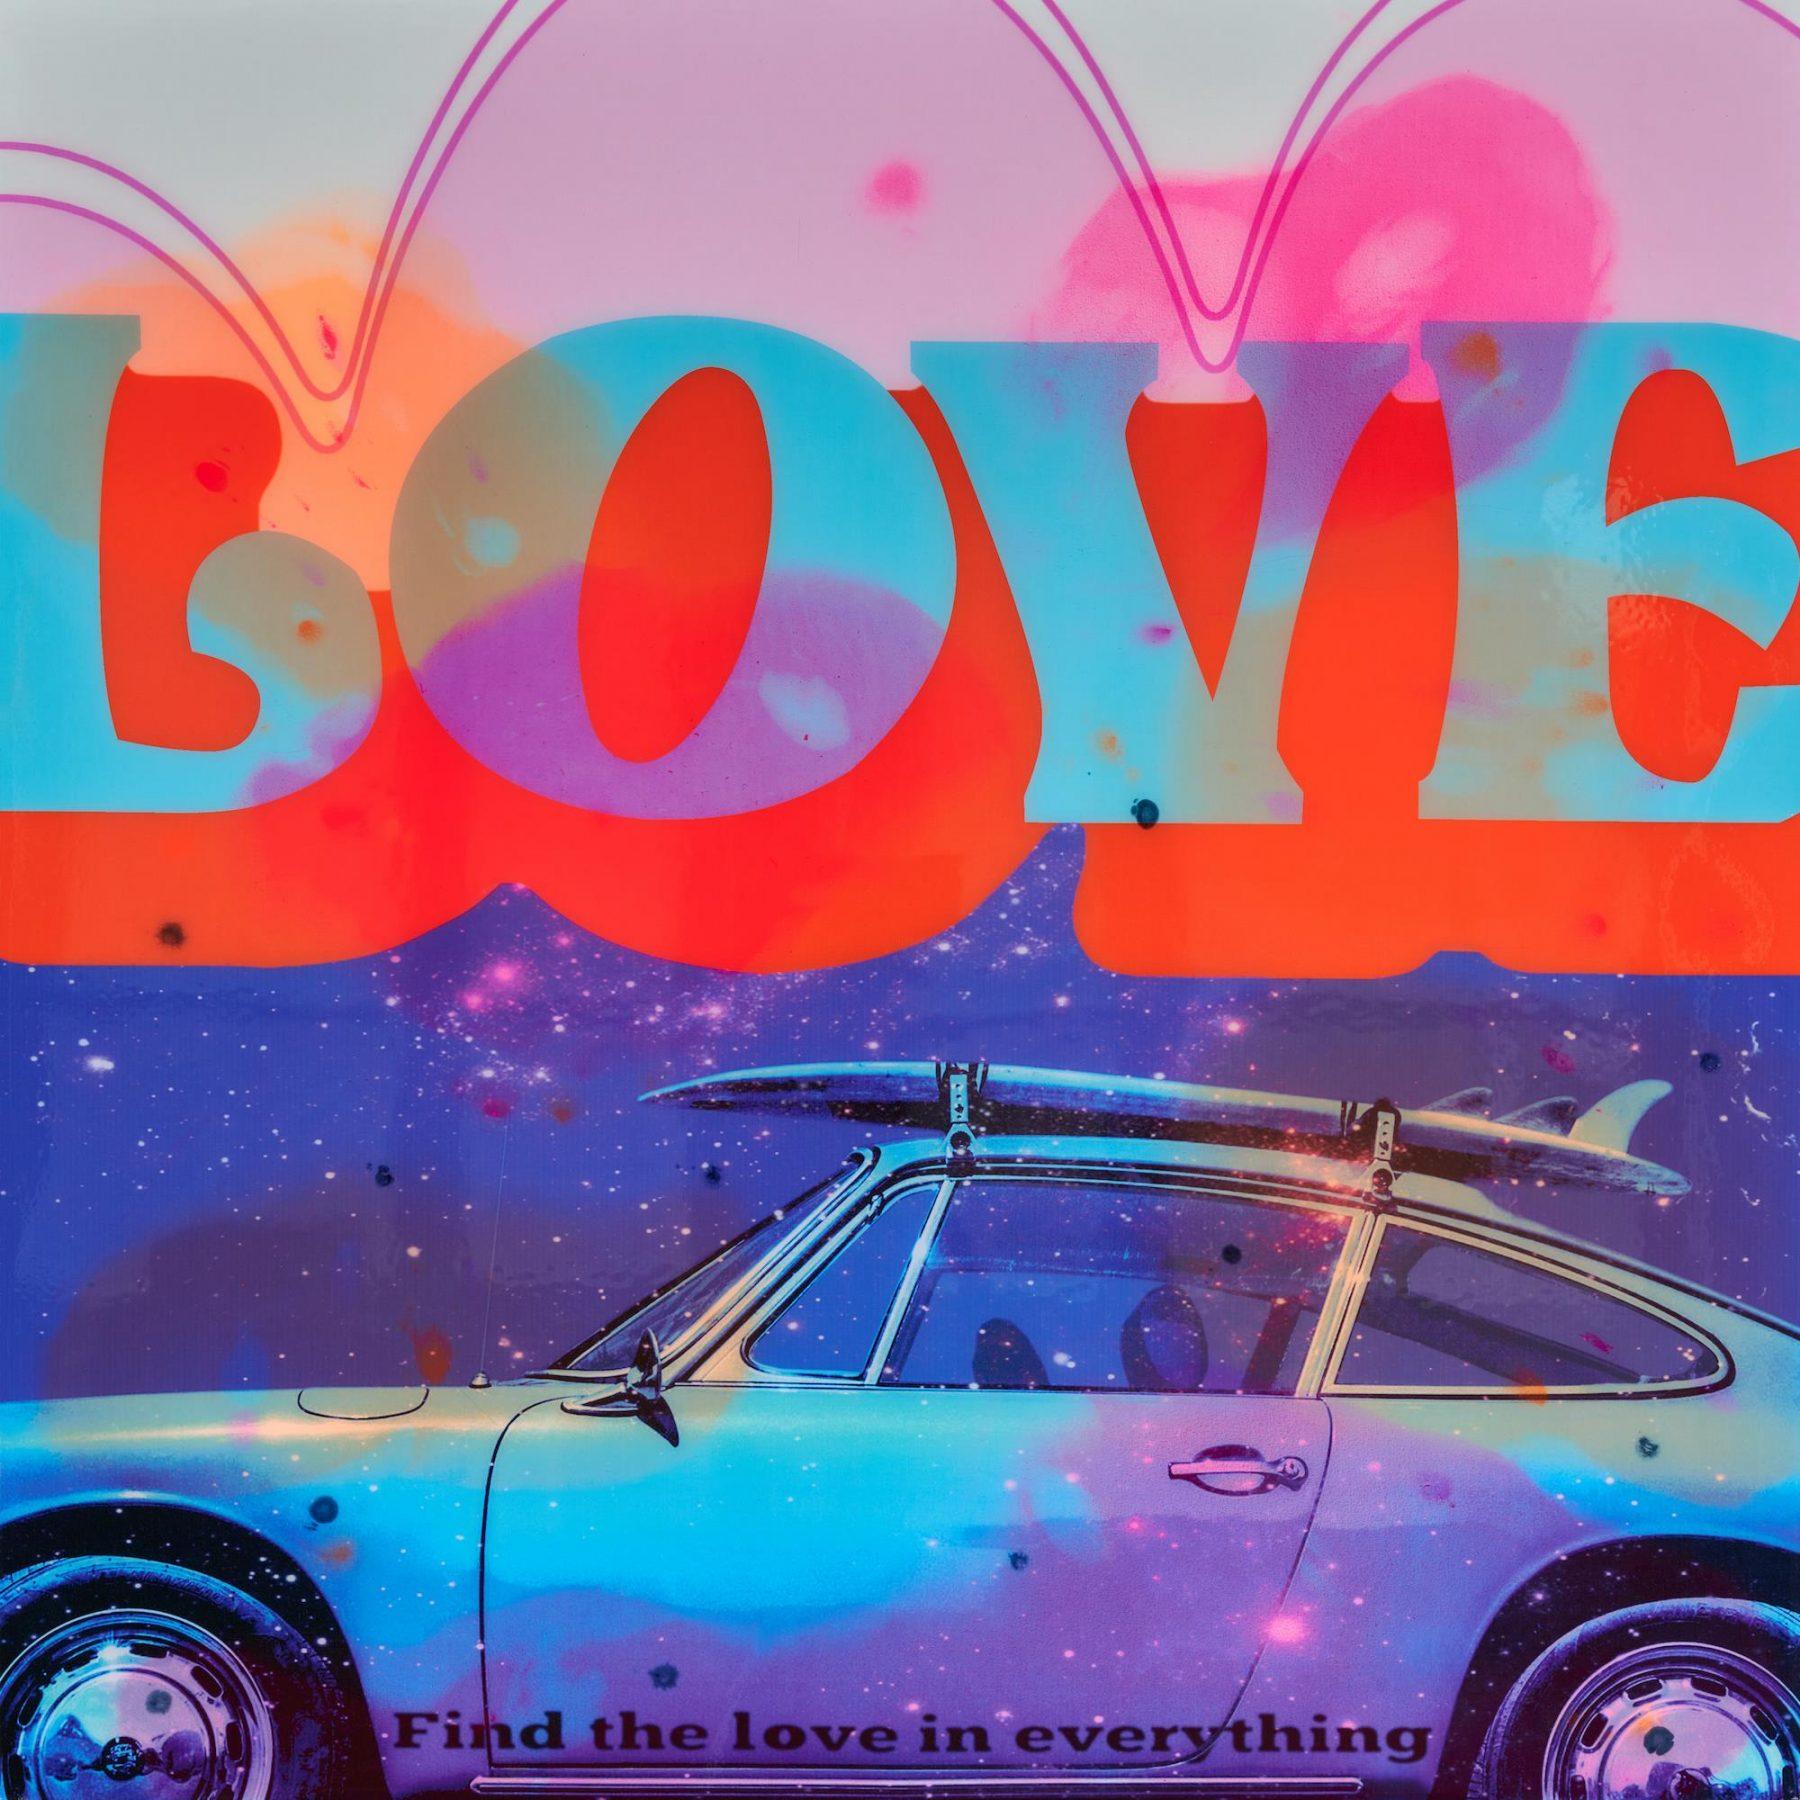 Love is everything - Döring, Jörg - k-D1o1LOIEb